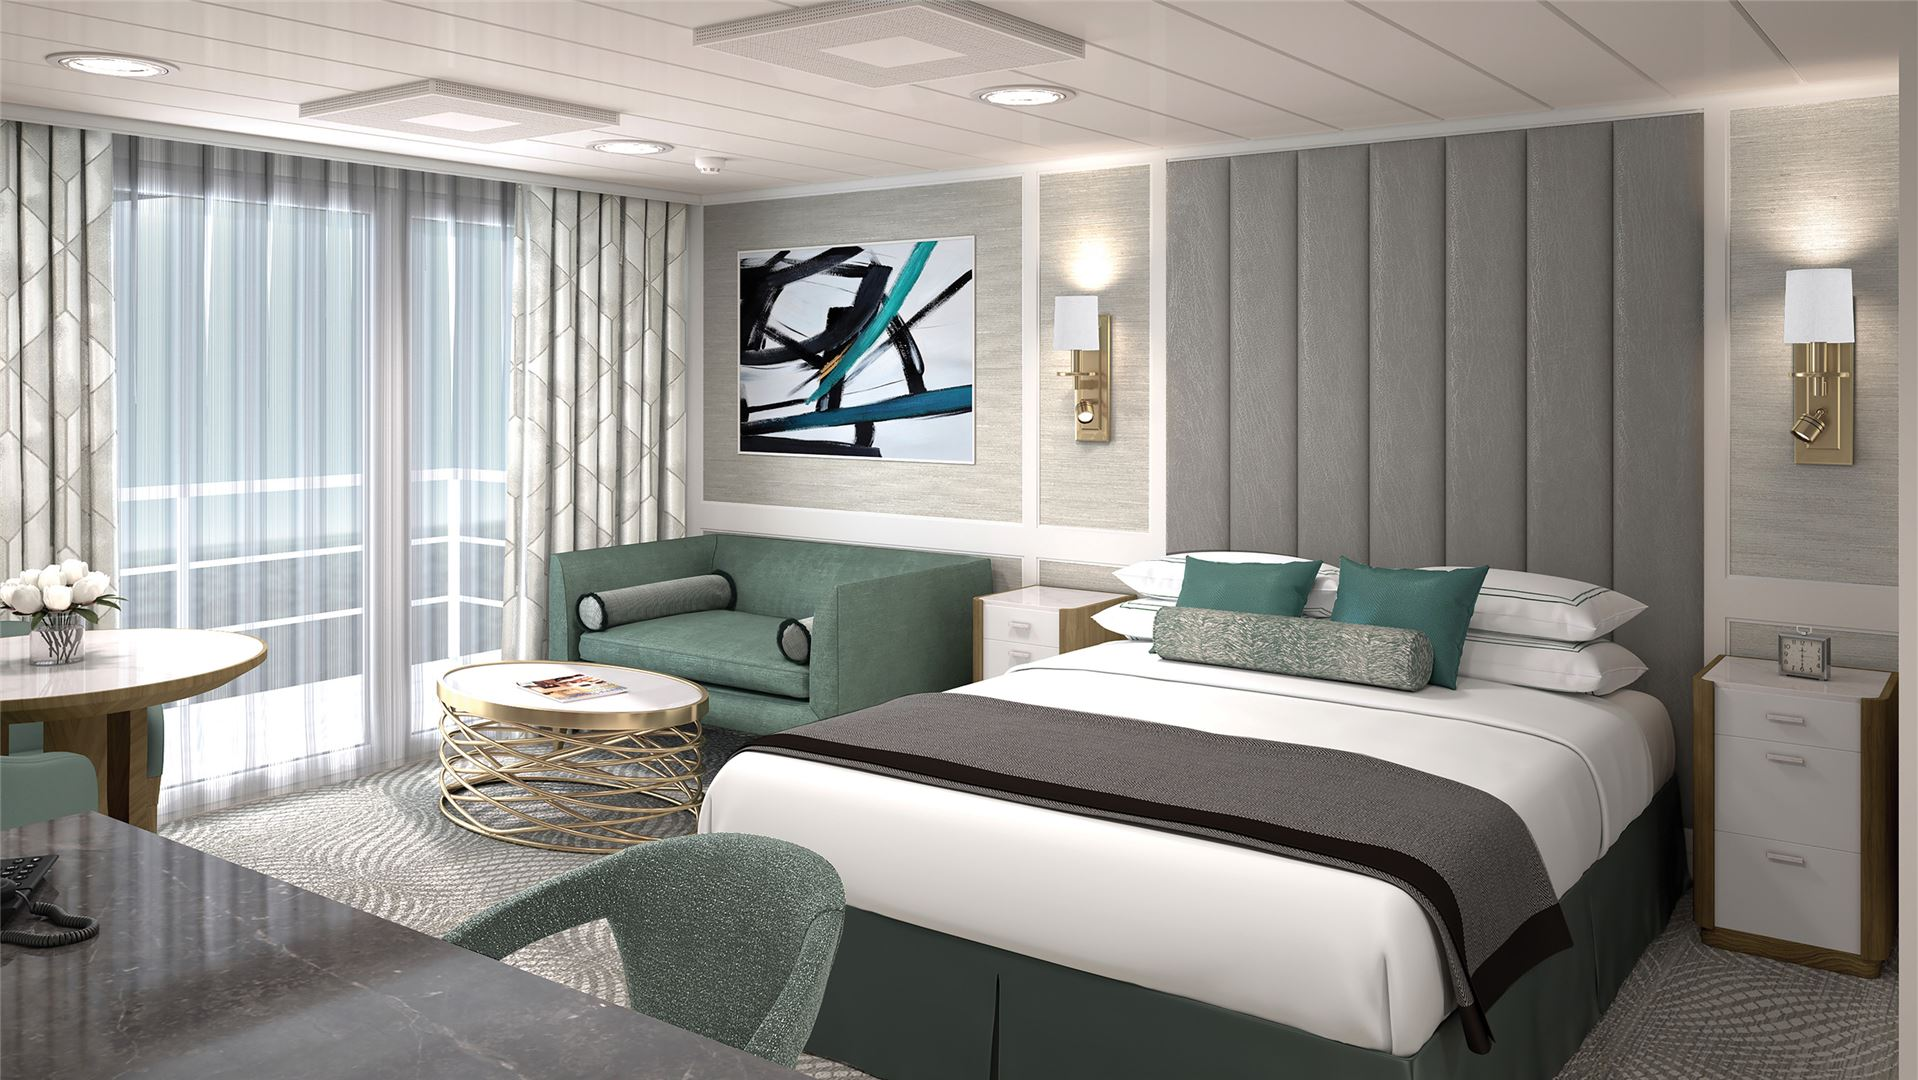 Penthouse Suite of the reimagined Regatta-Class ships            Concierge Veranda Stateroom of the reimagined Regatta-Class ships            Grand Hall View of the reimagined Regatta-Class ships